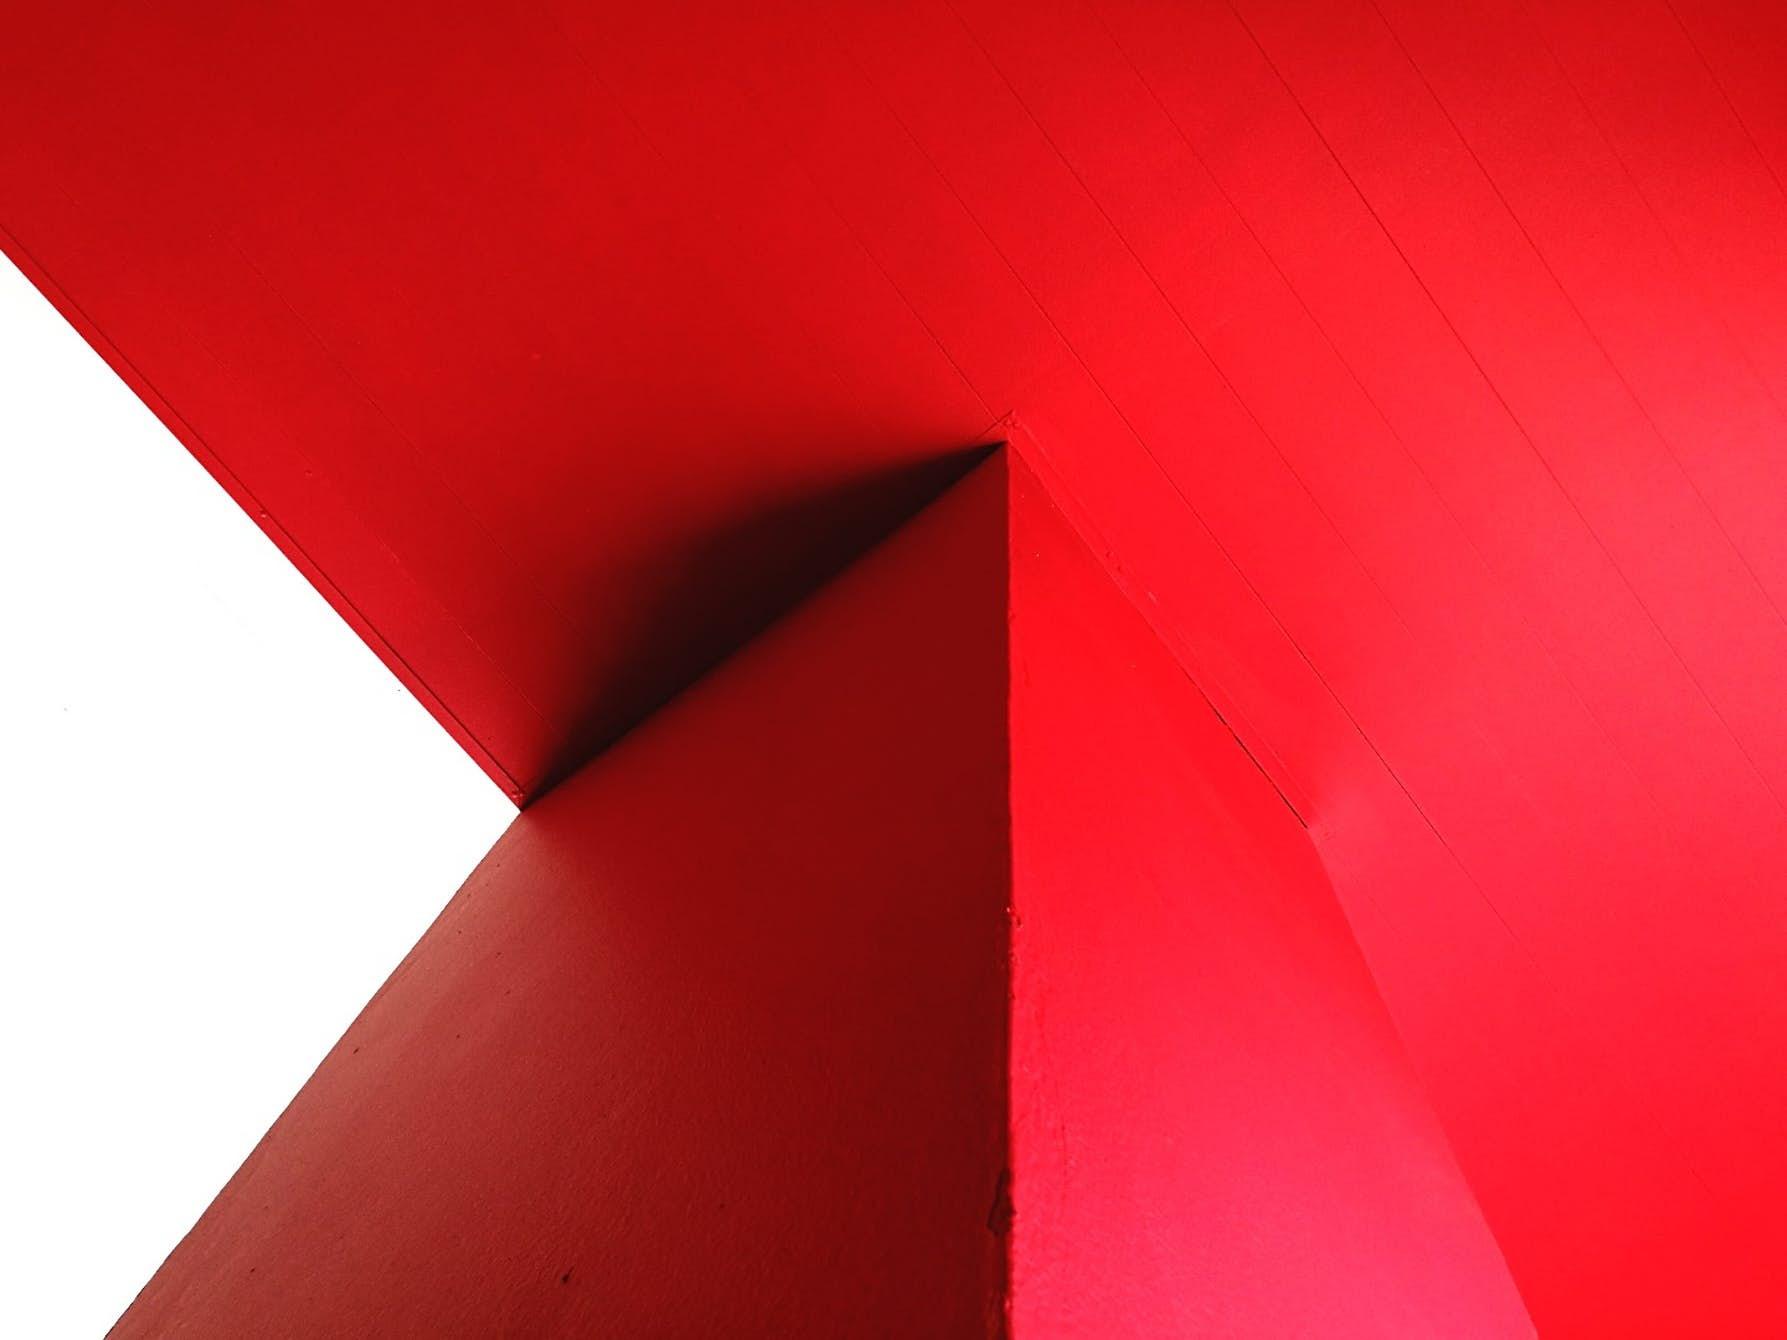 1489147925_minimalist-duvar-kagidi-10.jpg